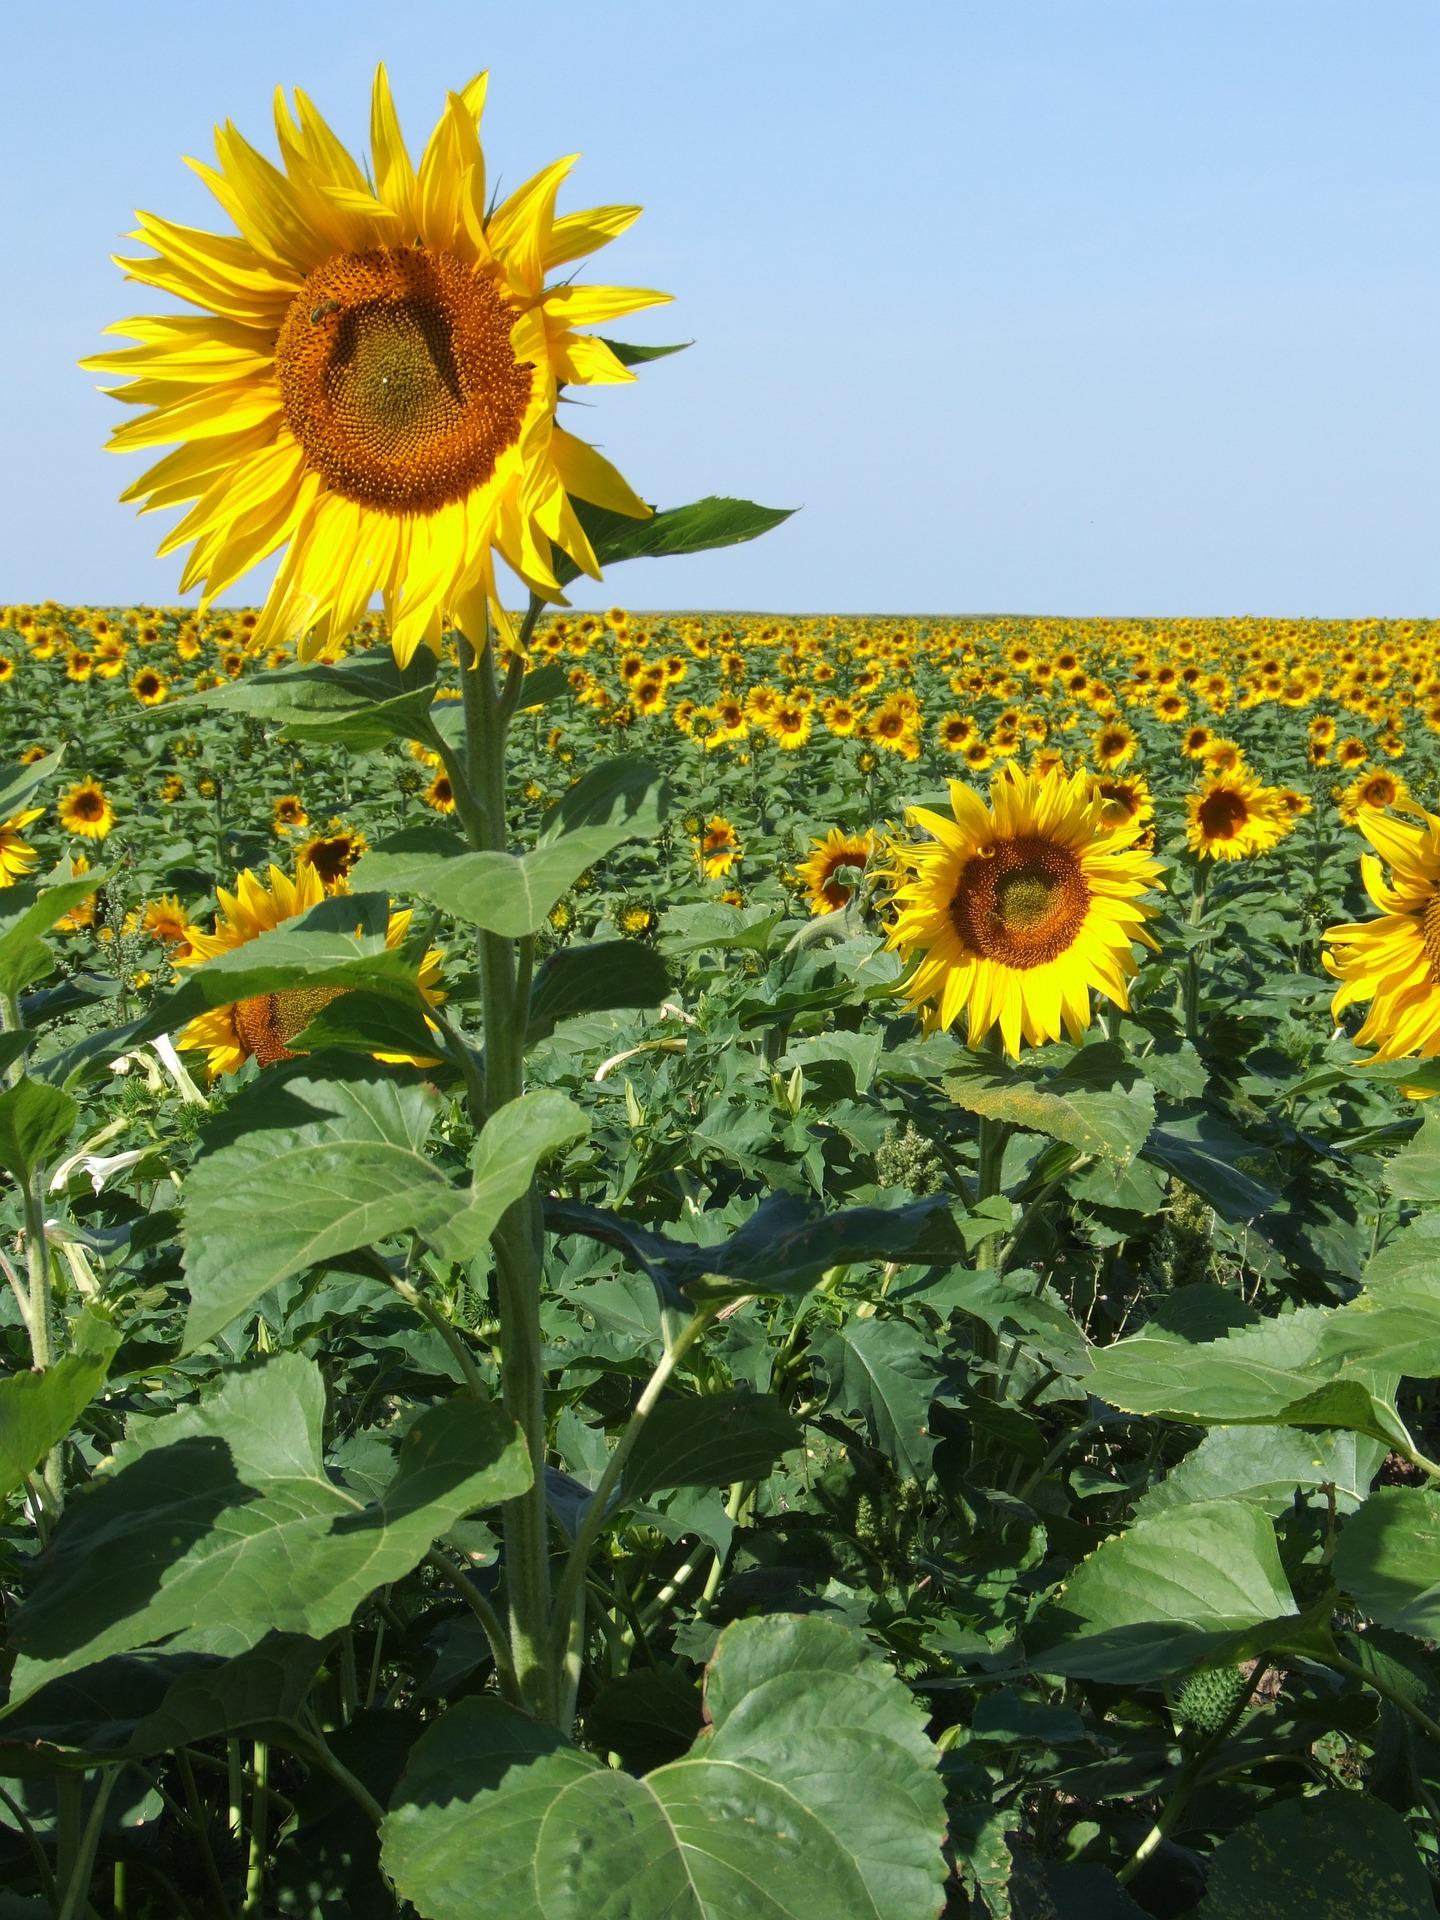 Sunflower Sticking Out.jpg